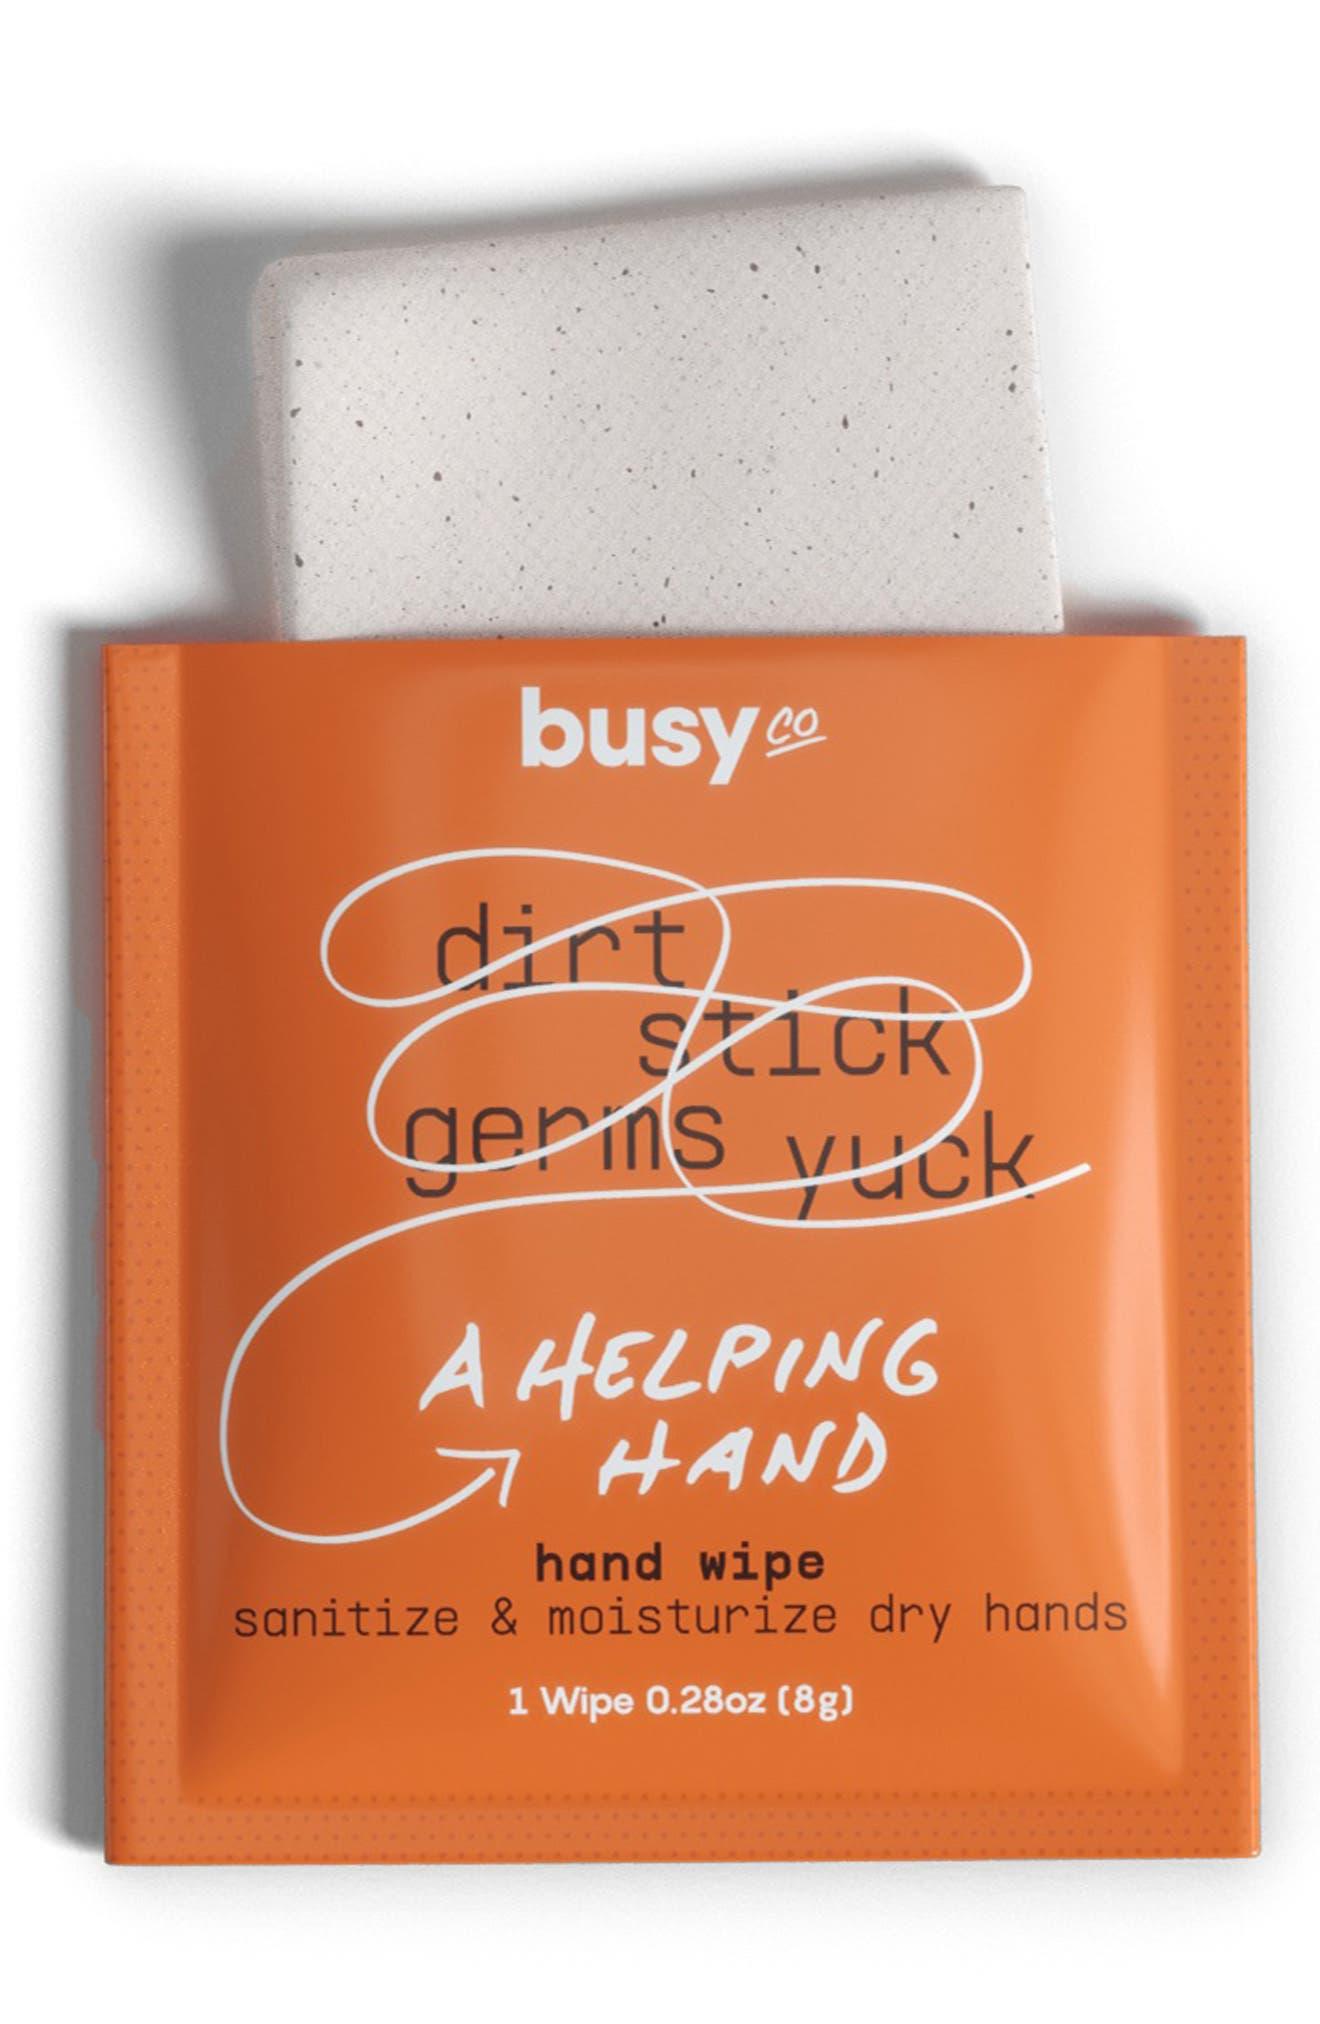 Hydrating Hand Sanitizing Wipes